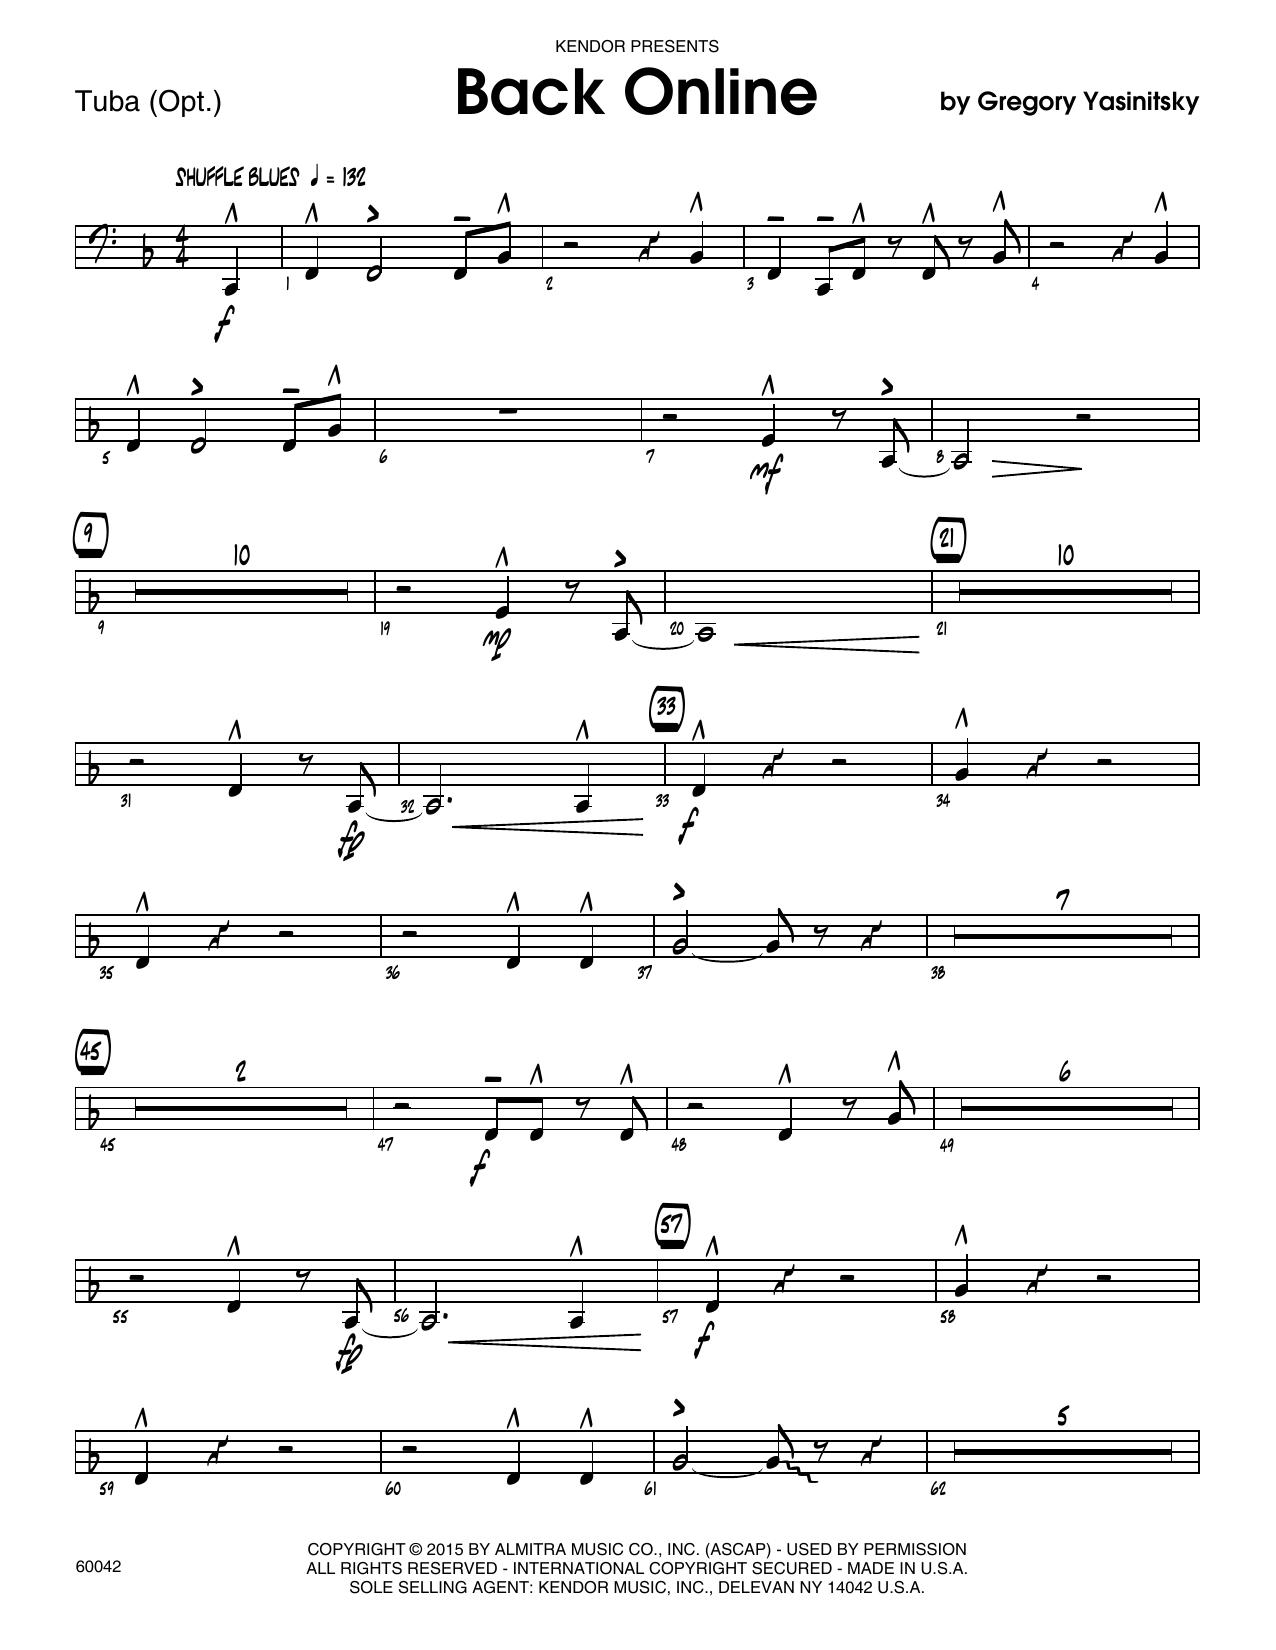 Back Online - Tuba by Gregory Yasinitsky Jazz Ensemble Digital Sheet Music